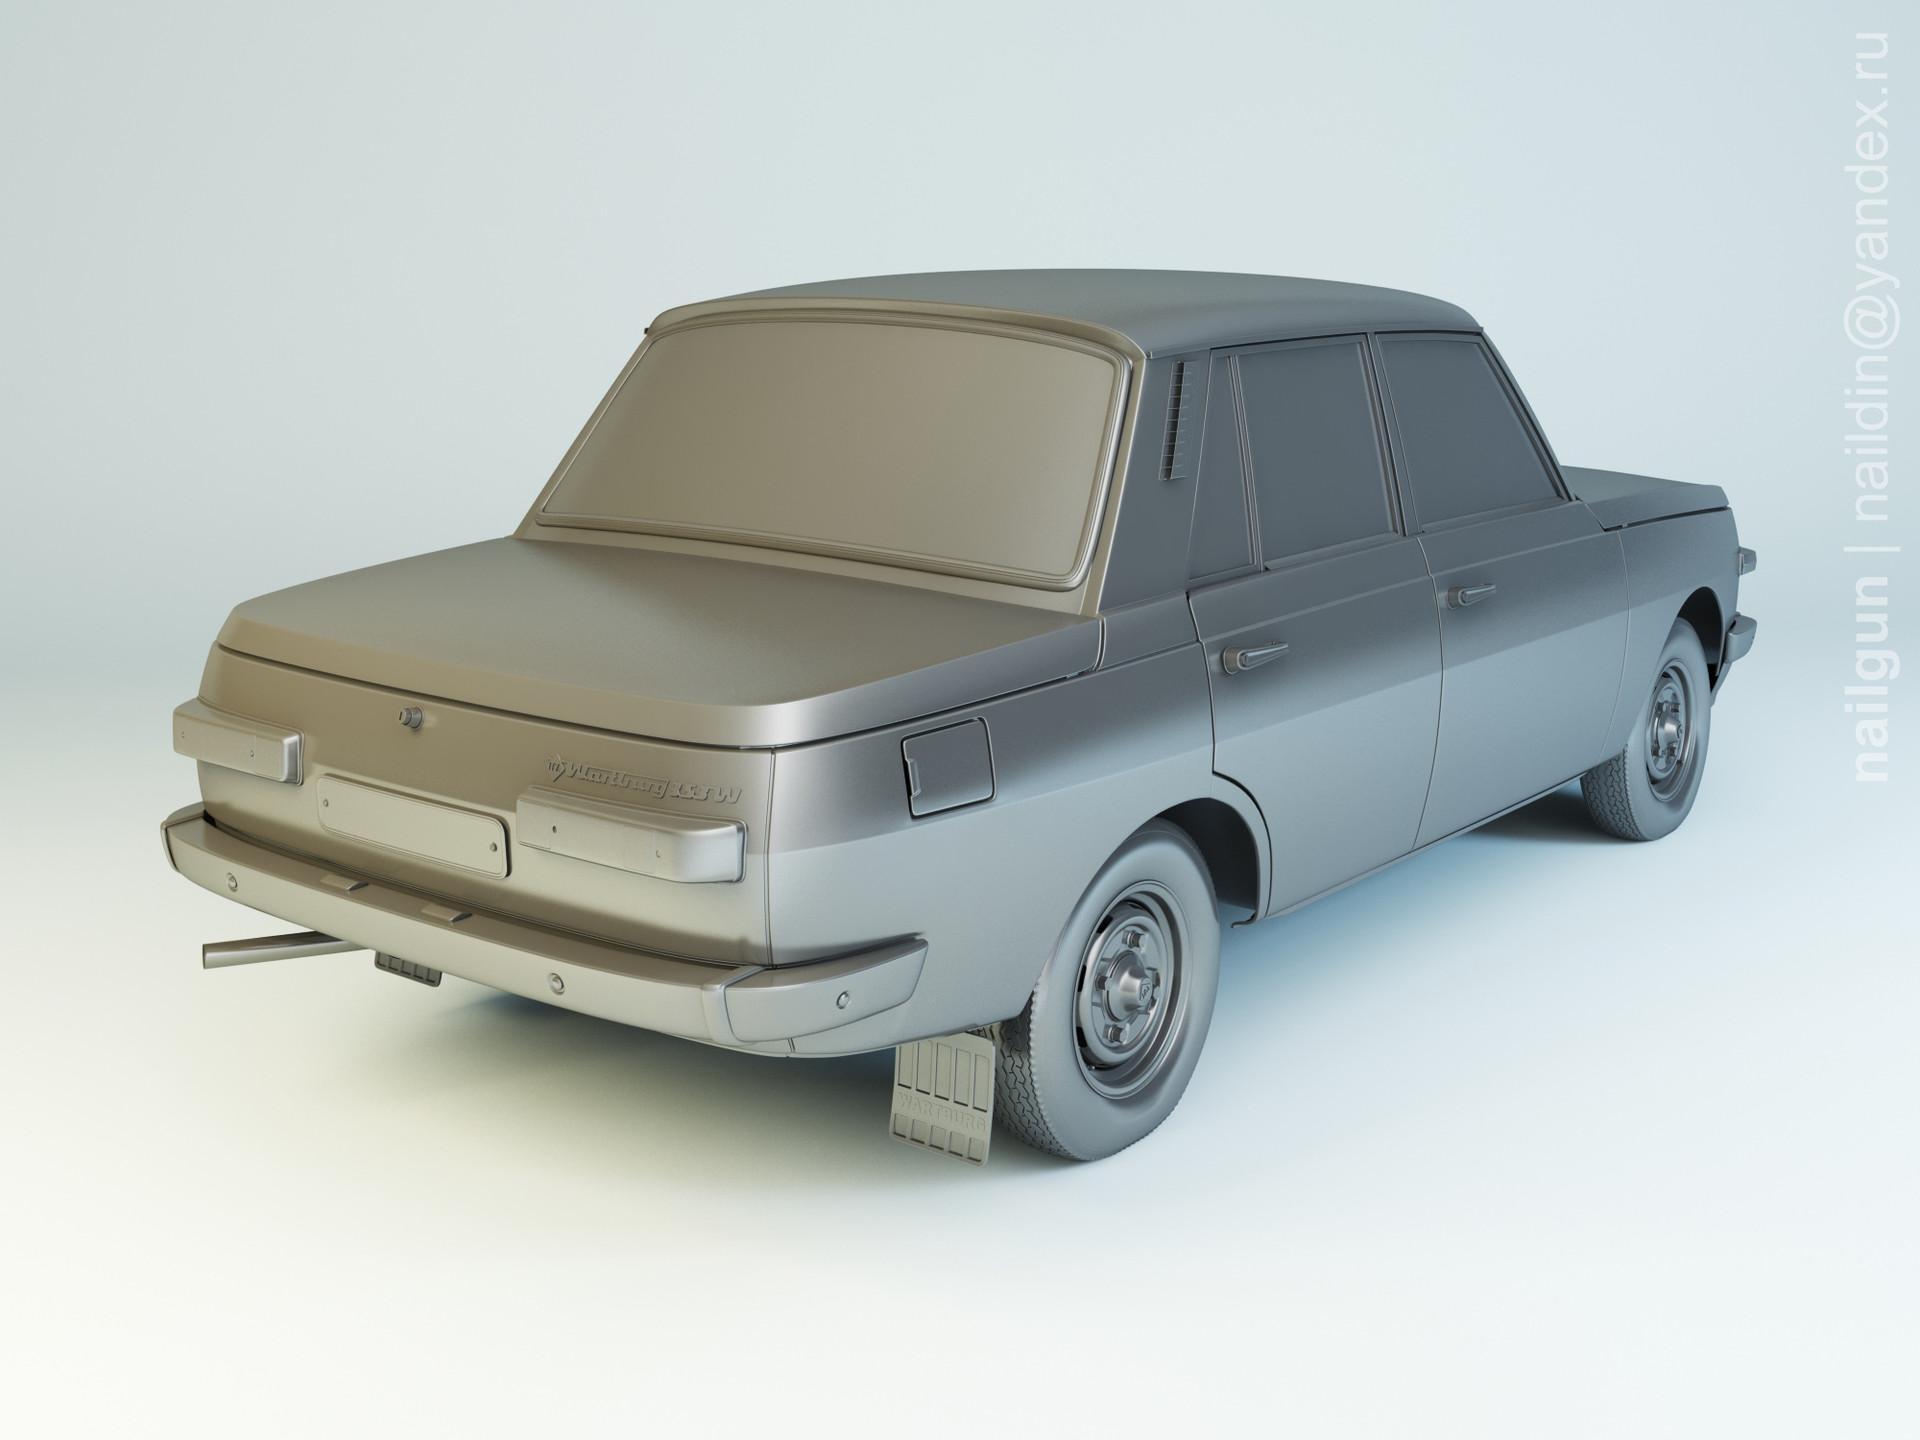 Nail khusnutdinov als 156 002 wartburg 353w modelling 1